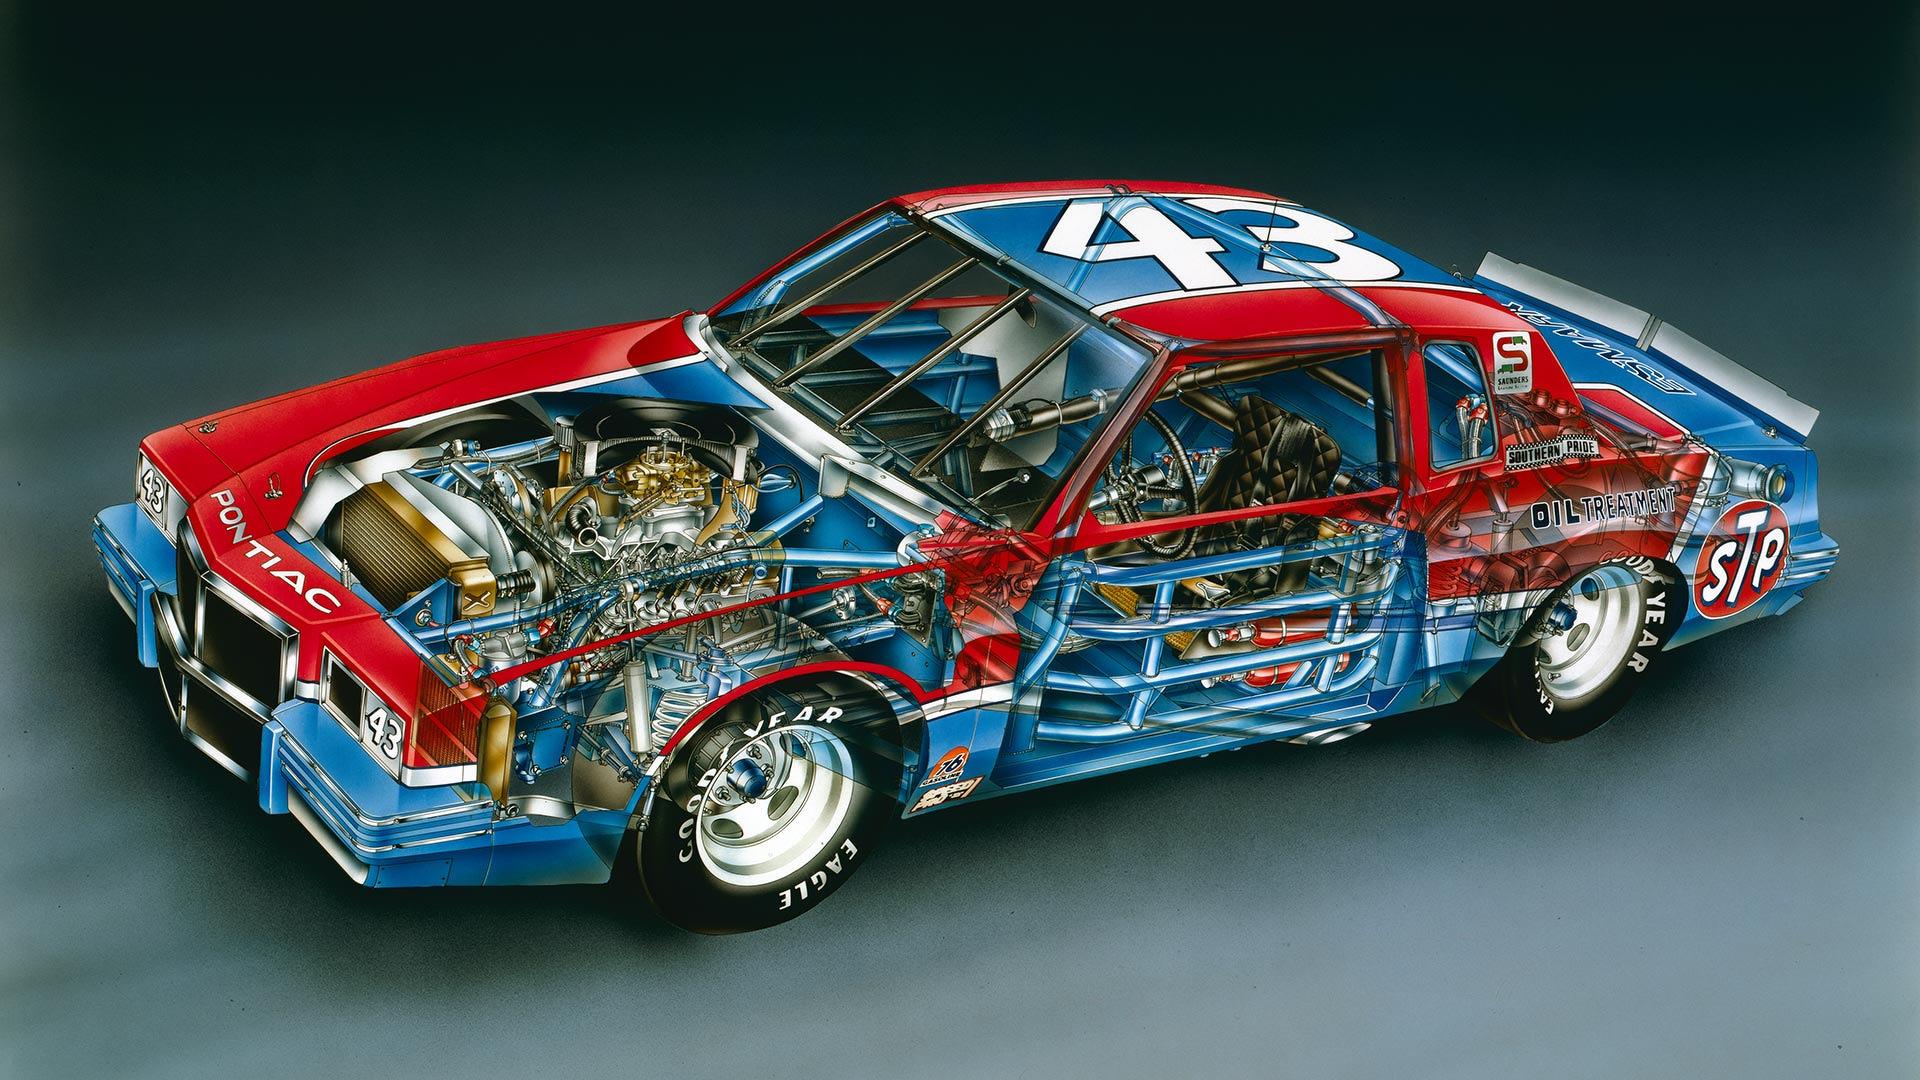 Kimble Kutaways 1982 Richard Petty No 43 Pontiac Grand Prix